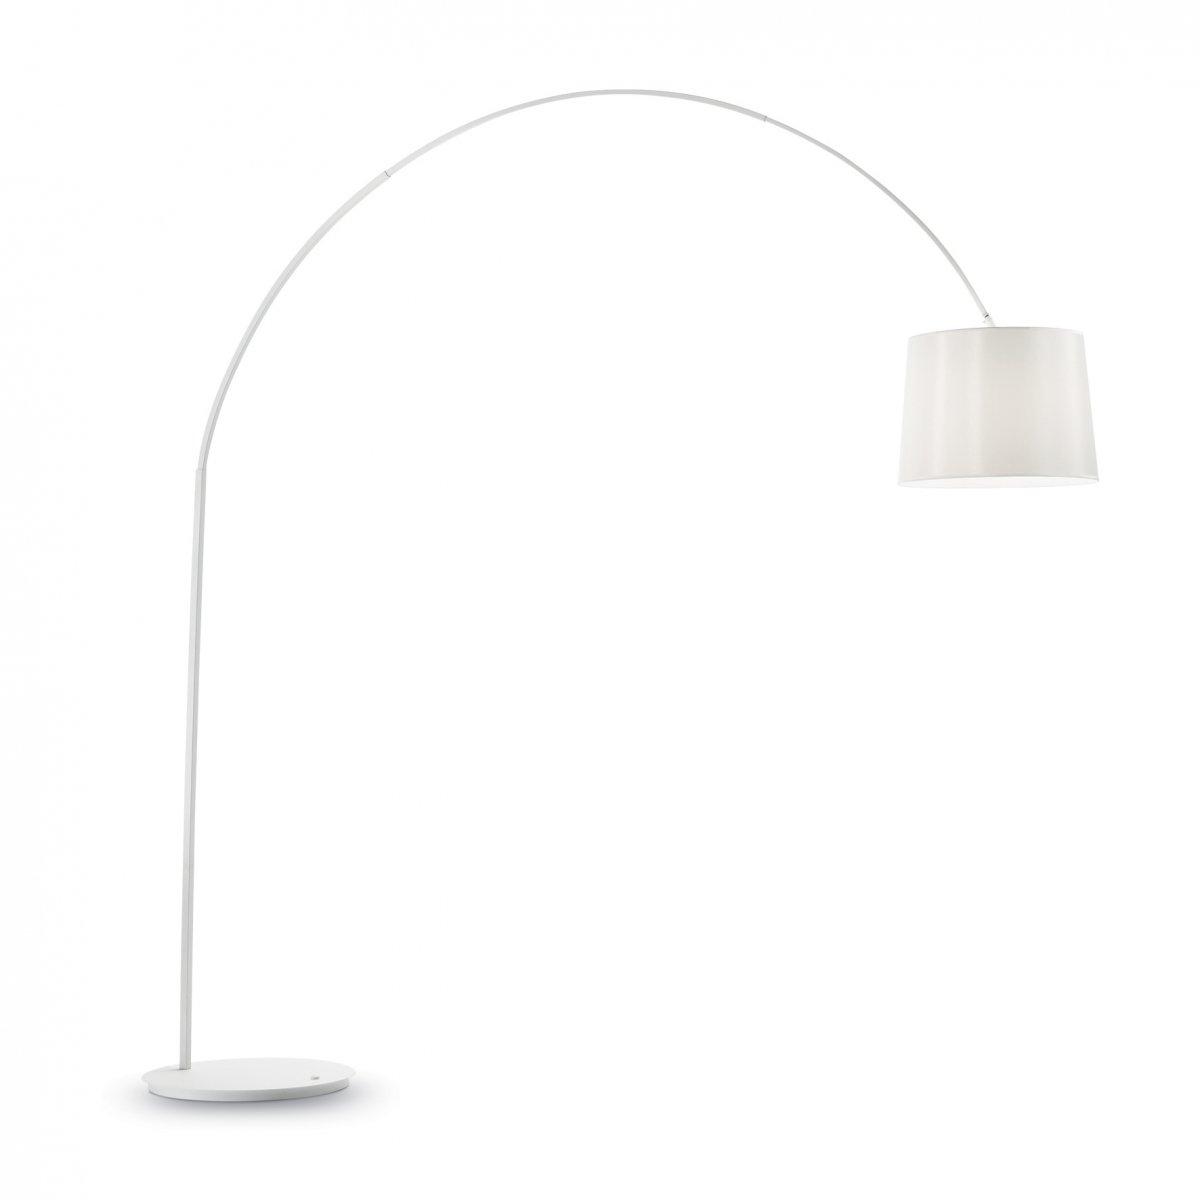 Ideal Lux DORSALE PT1 TOTAL WHITE LAMPADA DA TERRA